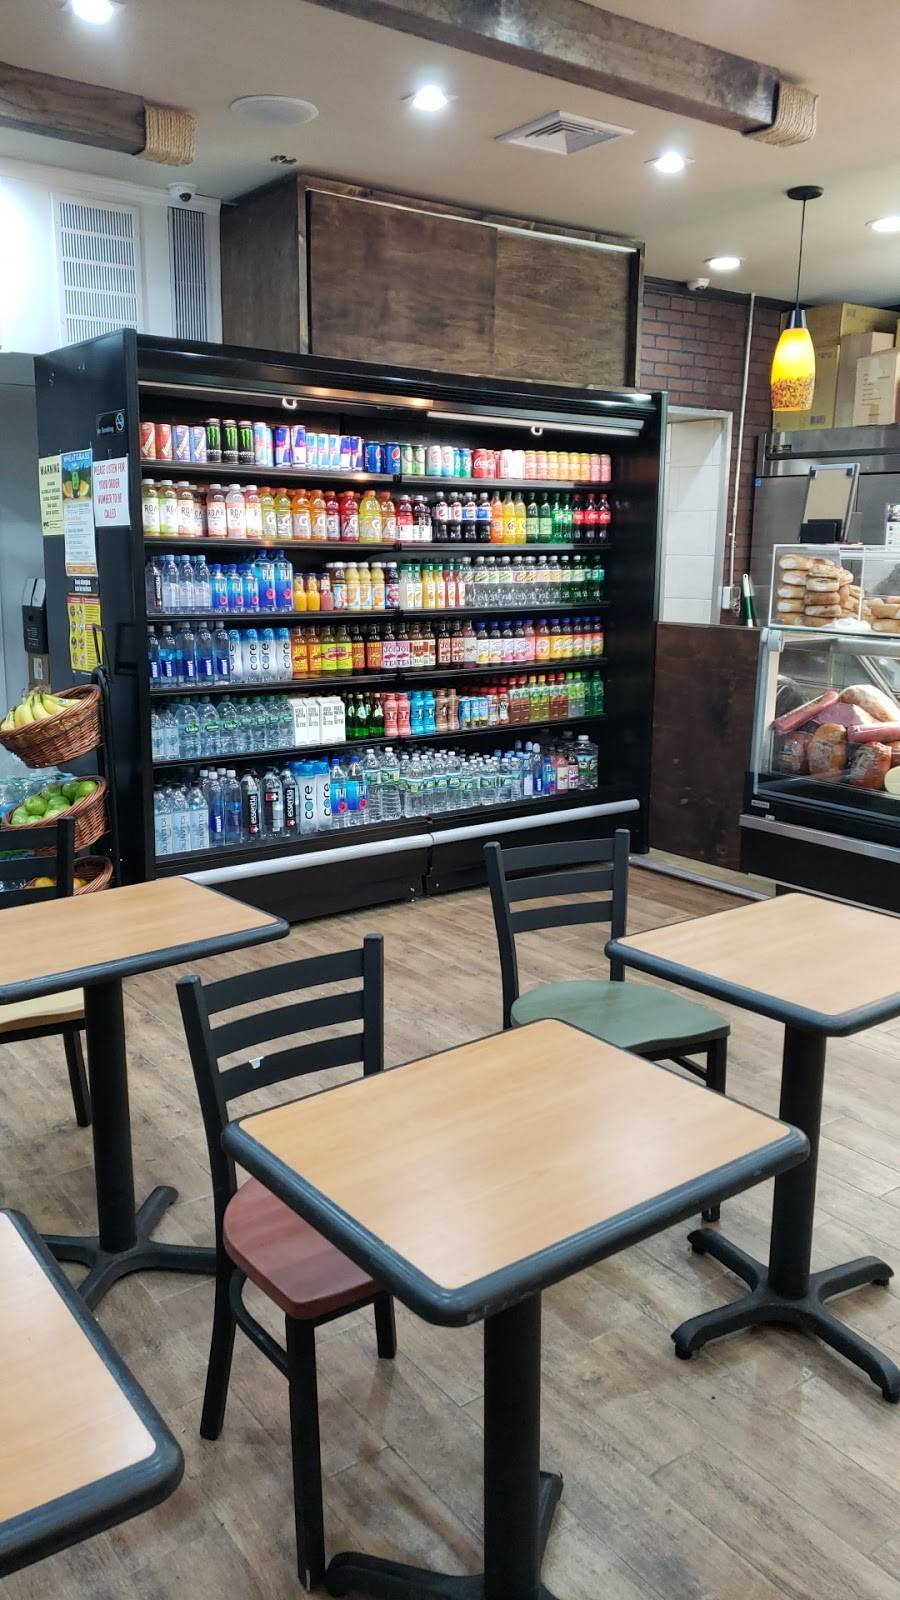 Go detox bar juice and grill | restaurant | 8824 Van Wyck Expy, Jamaica, NY 11418, USA | 7187393444 OR +1 718-739-3444